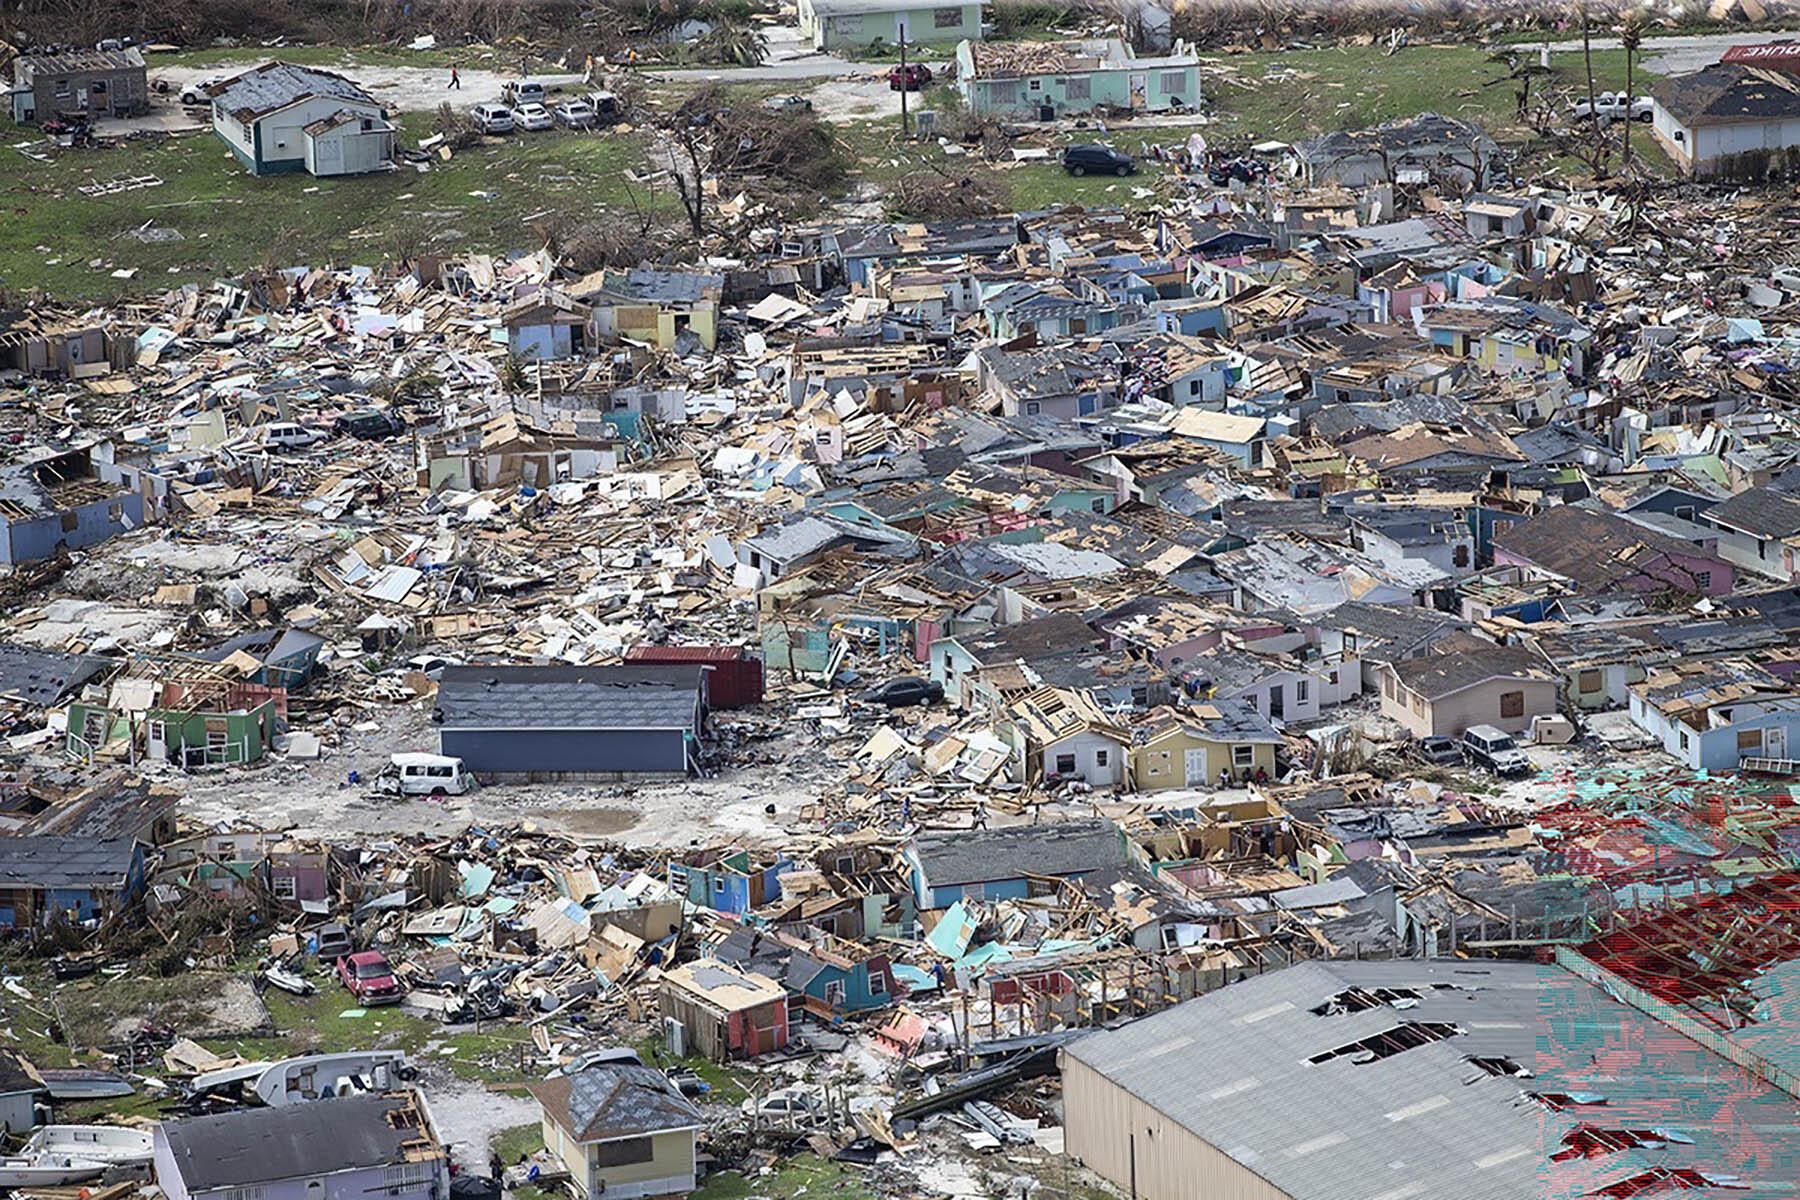 Hurricane death toll climbs to 20 in devastated Bahamas | CBS 17